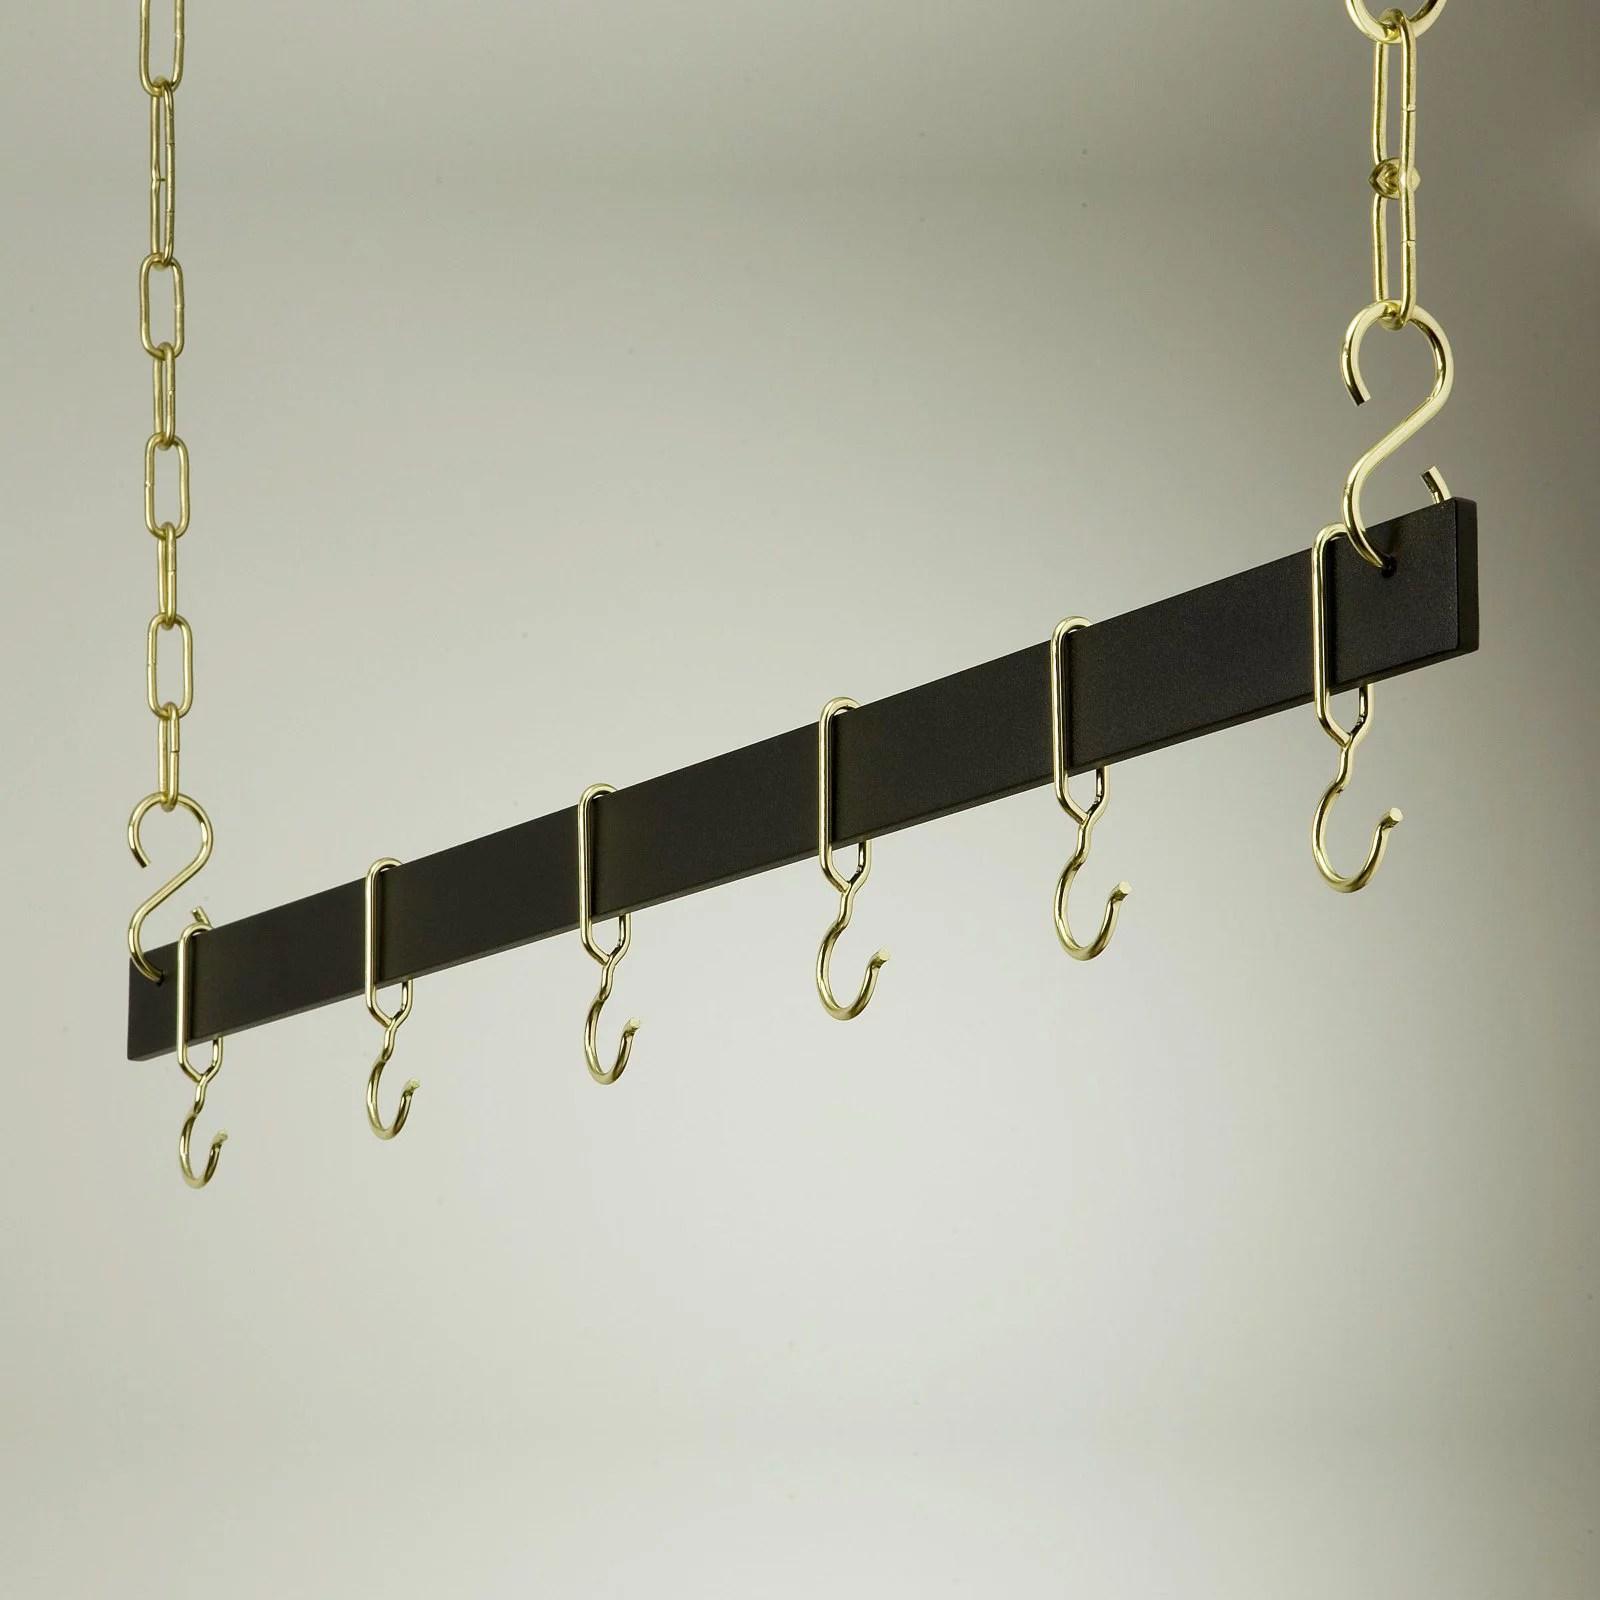 euro black and brass hanging bar pot rack